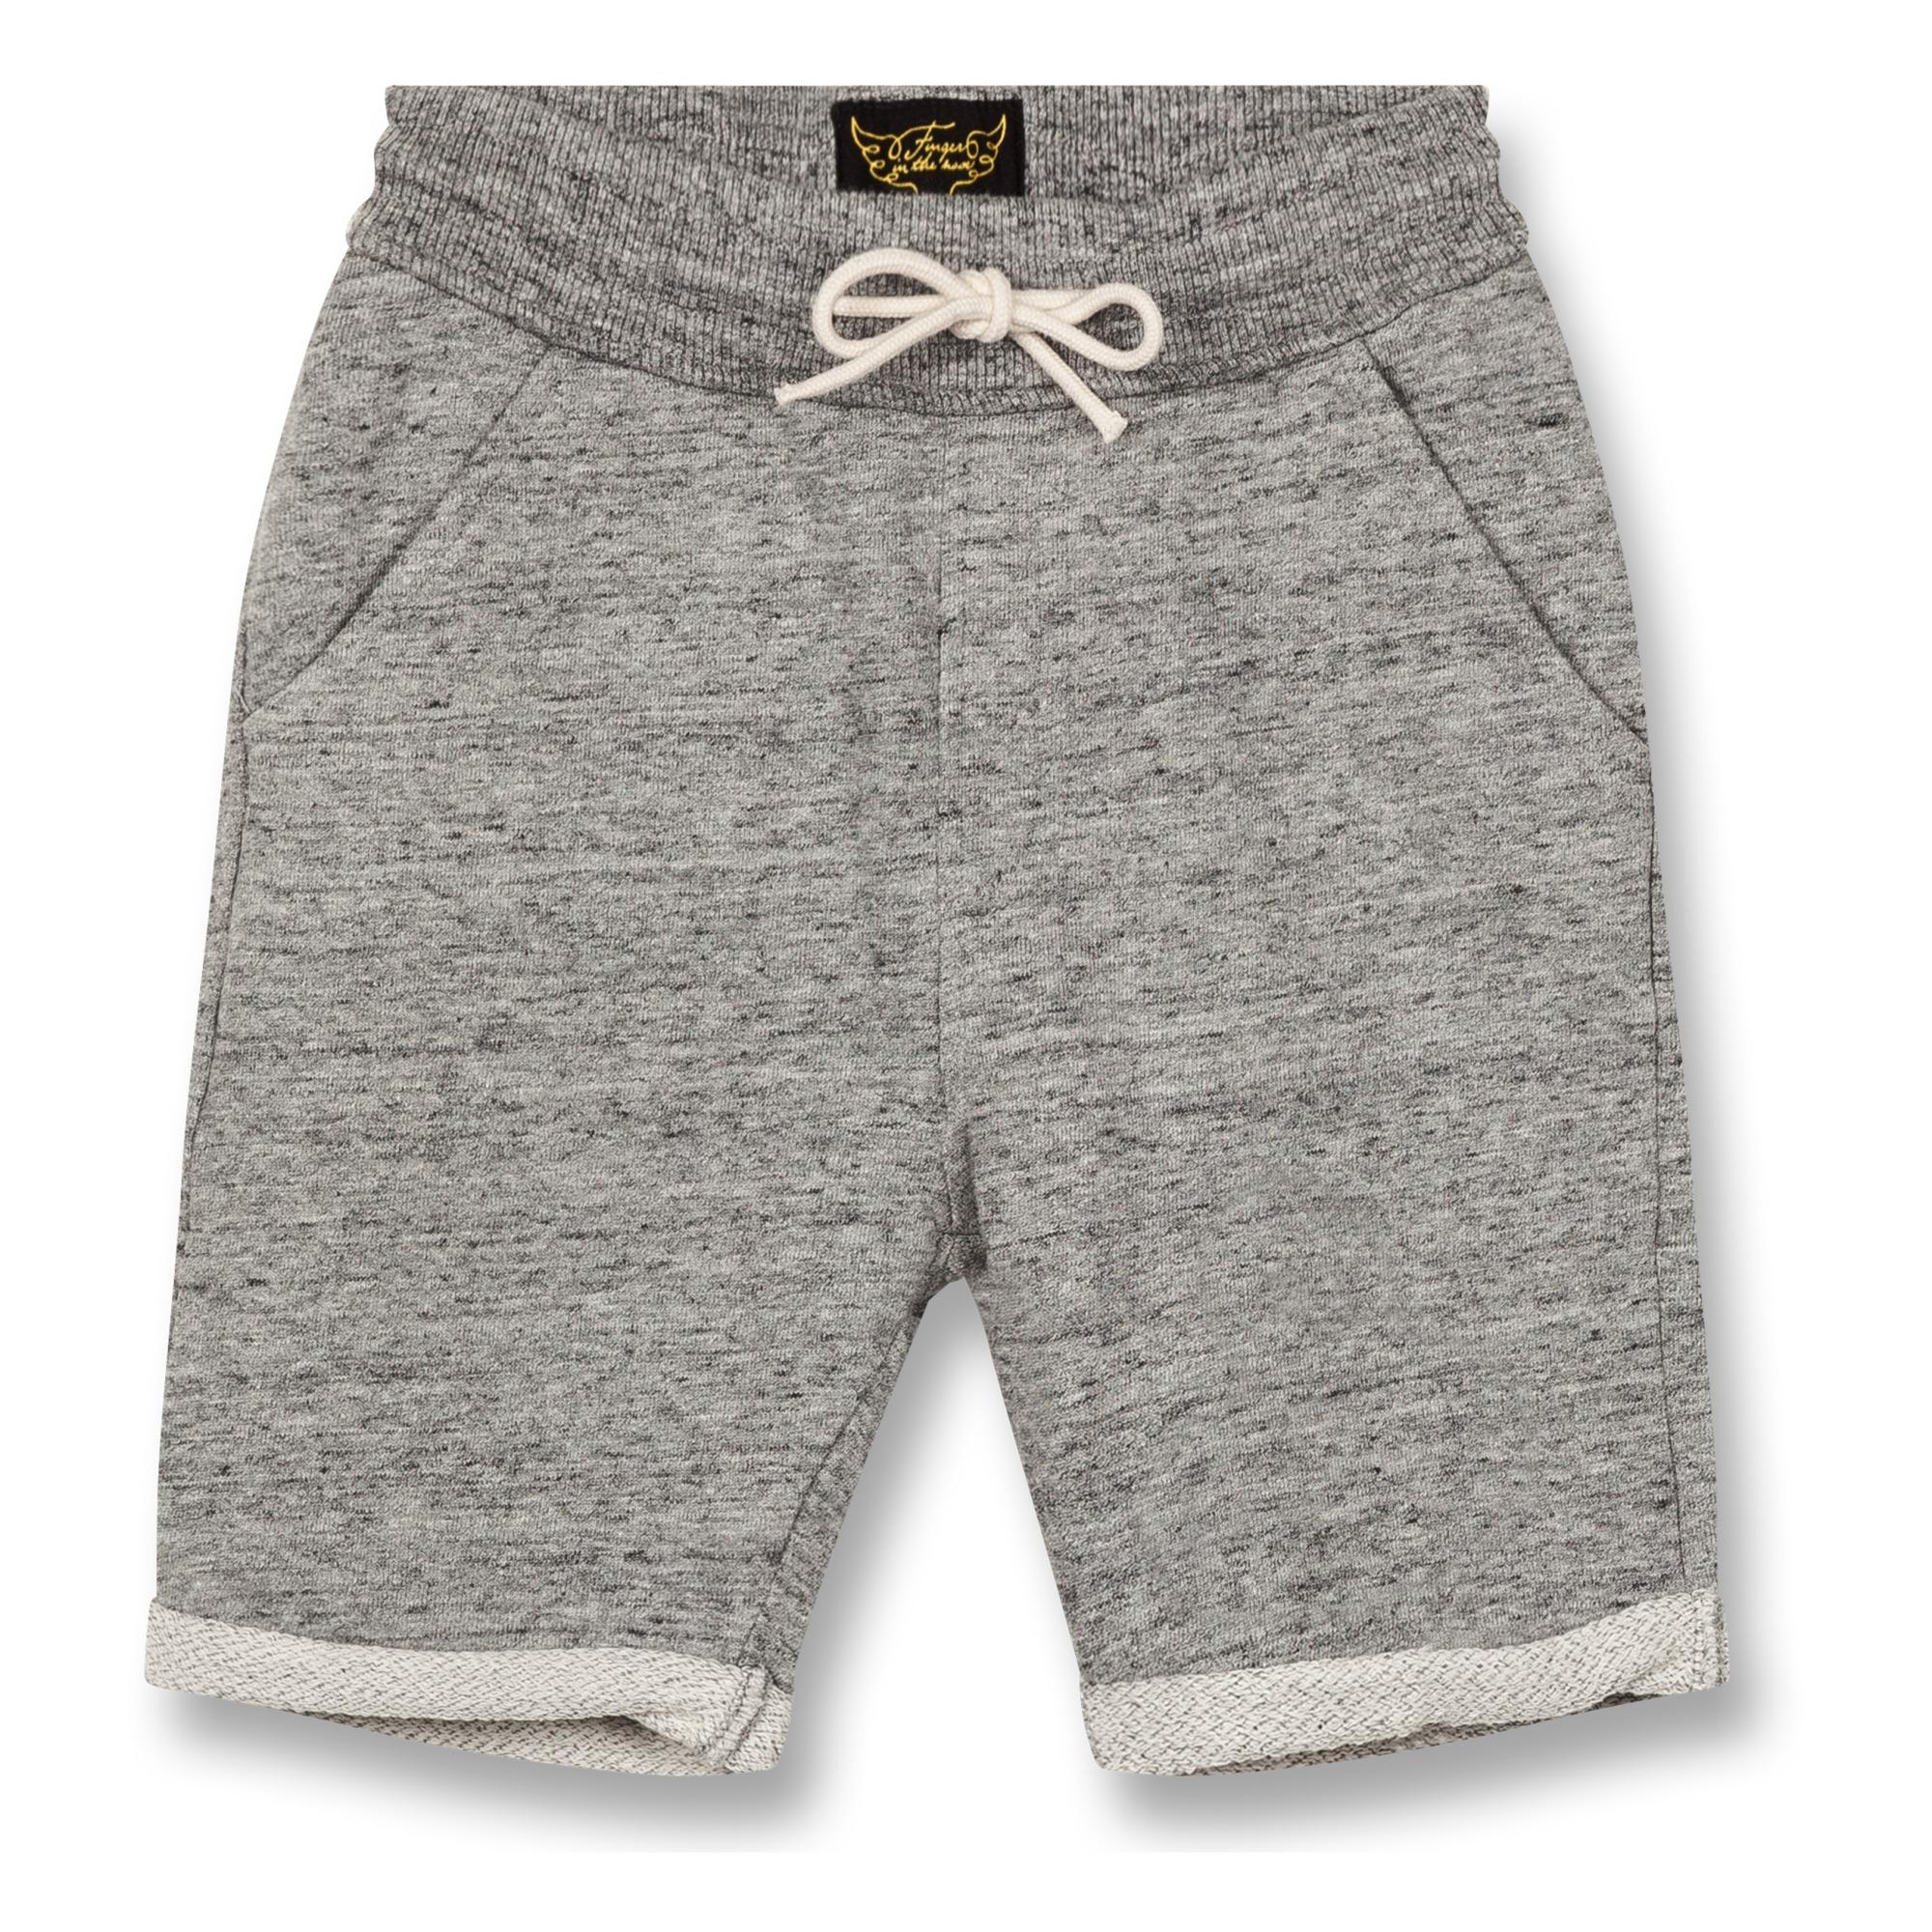 e90ef4c52b Kids Clothing ⋅ Kids Fashion ⋅ Smallable. «